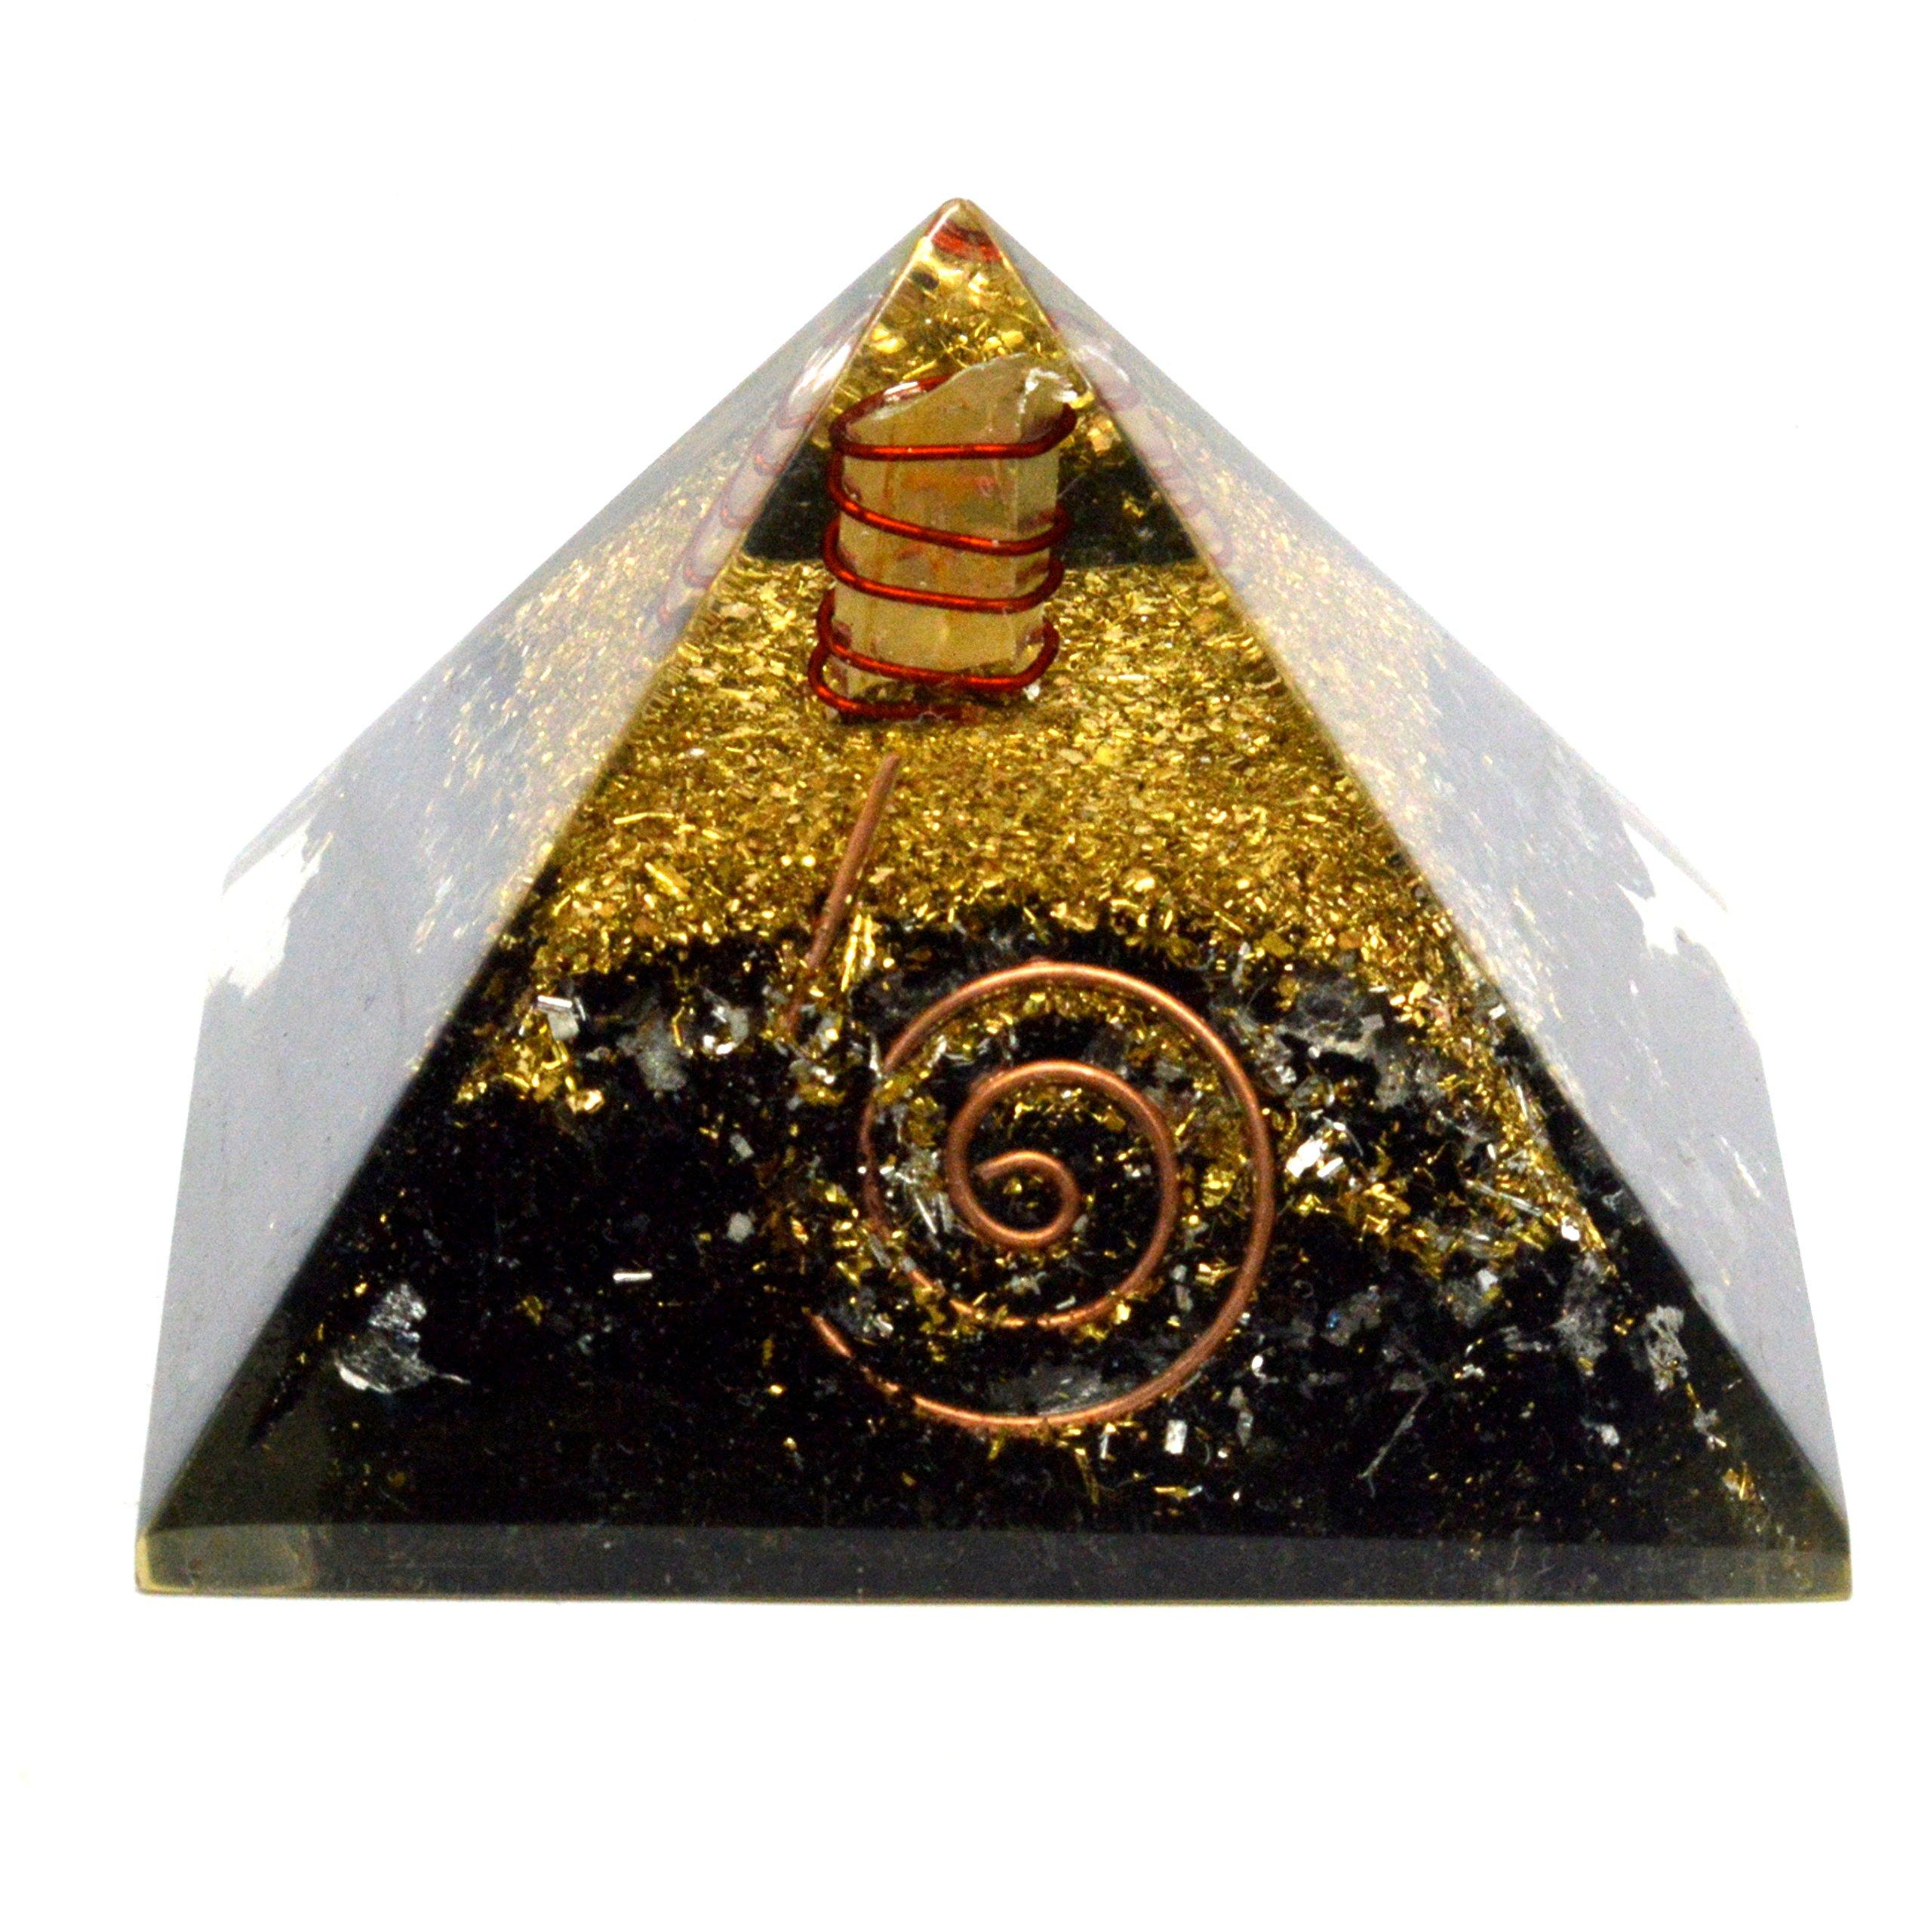 Healing Crystals India Black Tourmaline Orgonite Pyramid Energy Charged Reiki Healing Semi Precious Gemstone Free eBook about Crystal Healing (2.5''inch - Orgone)